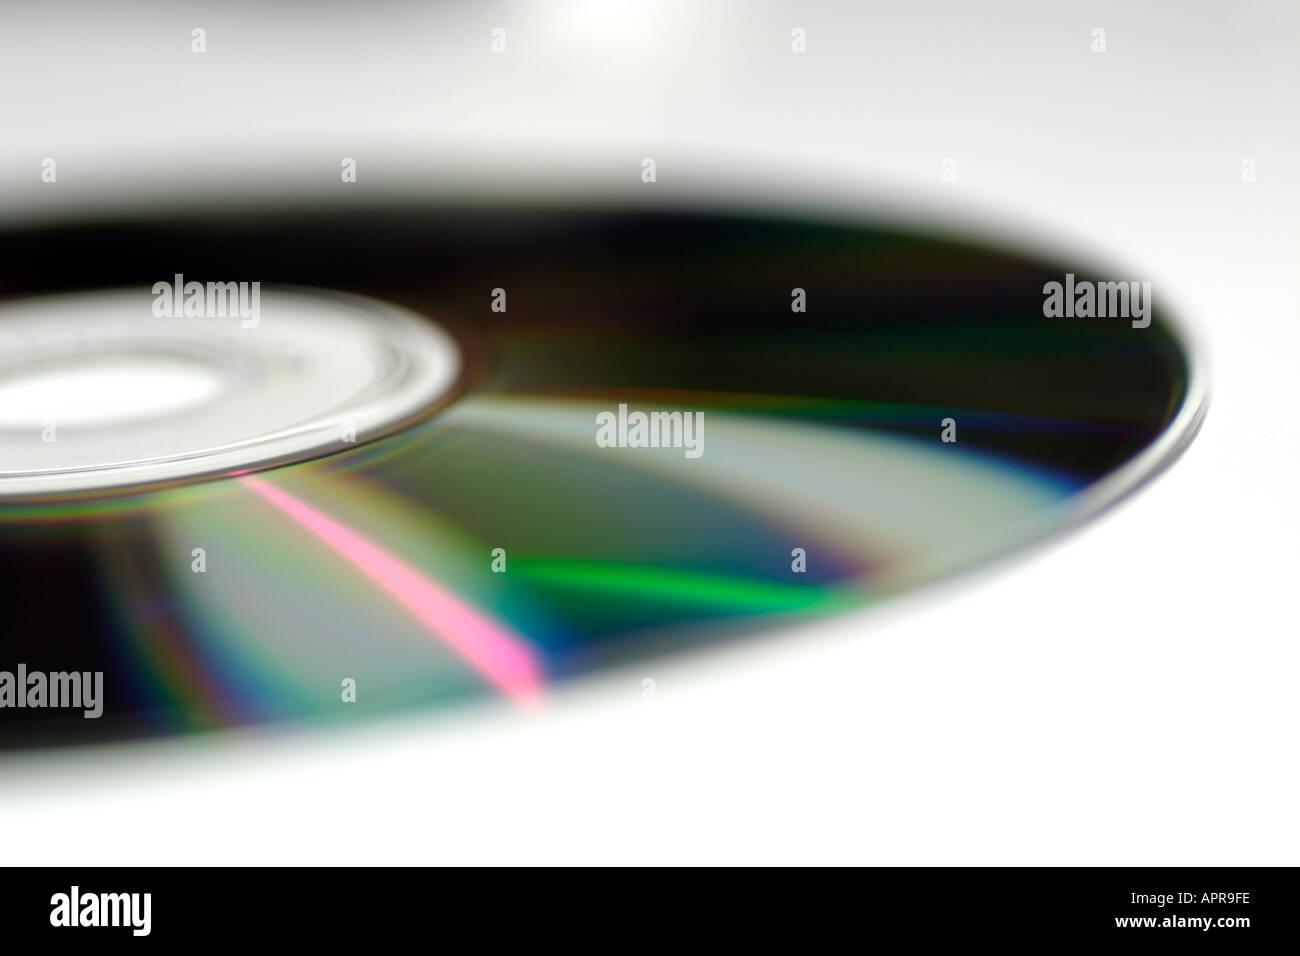 media storage dvd cd cd rom burn rip r r rw disc disk future tech technology movie music mp3 mp4 medium communication Stock Photo